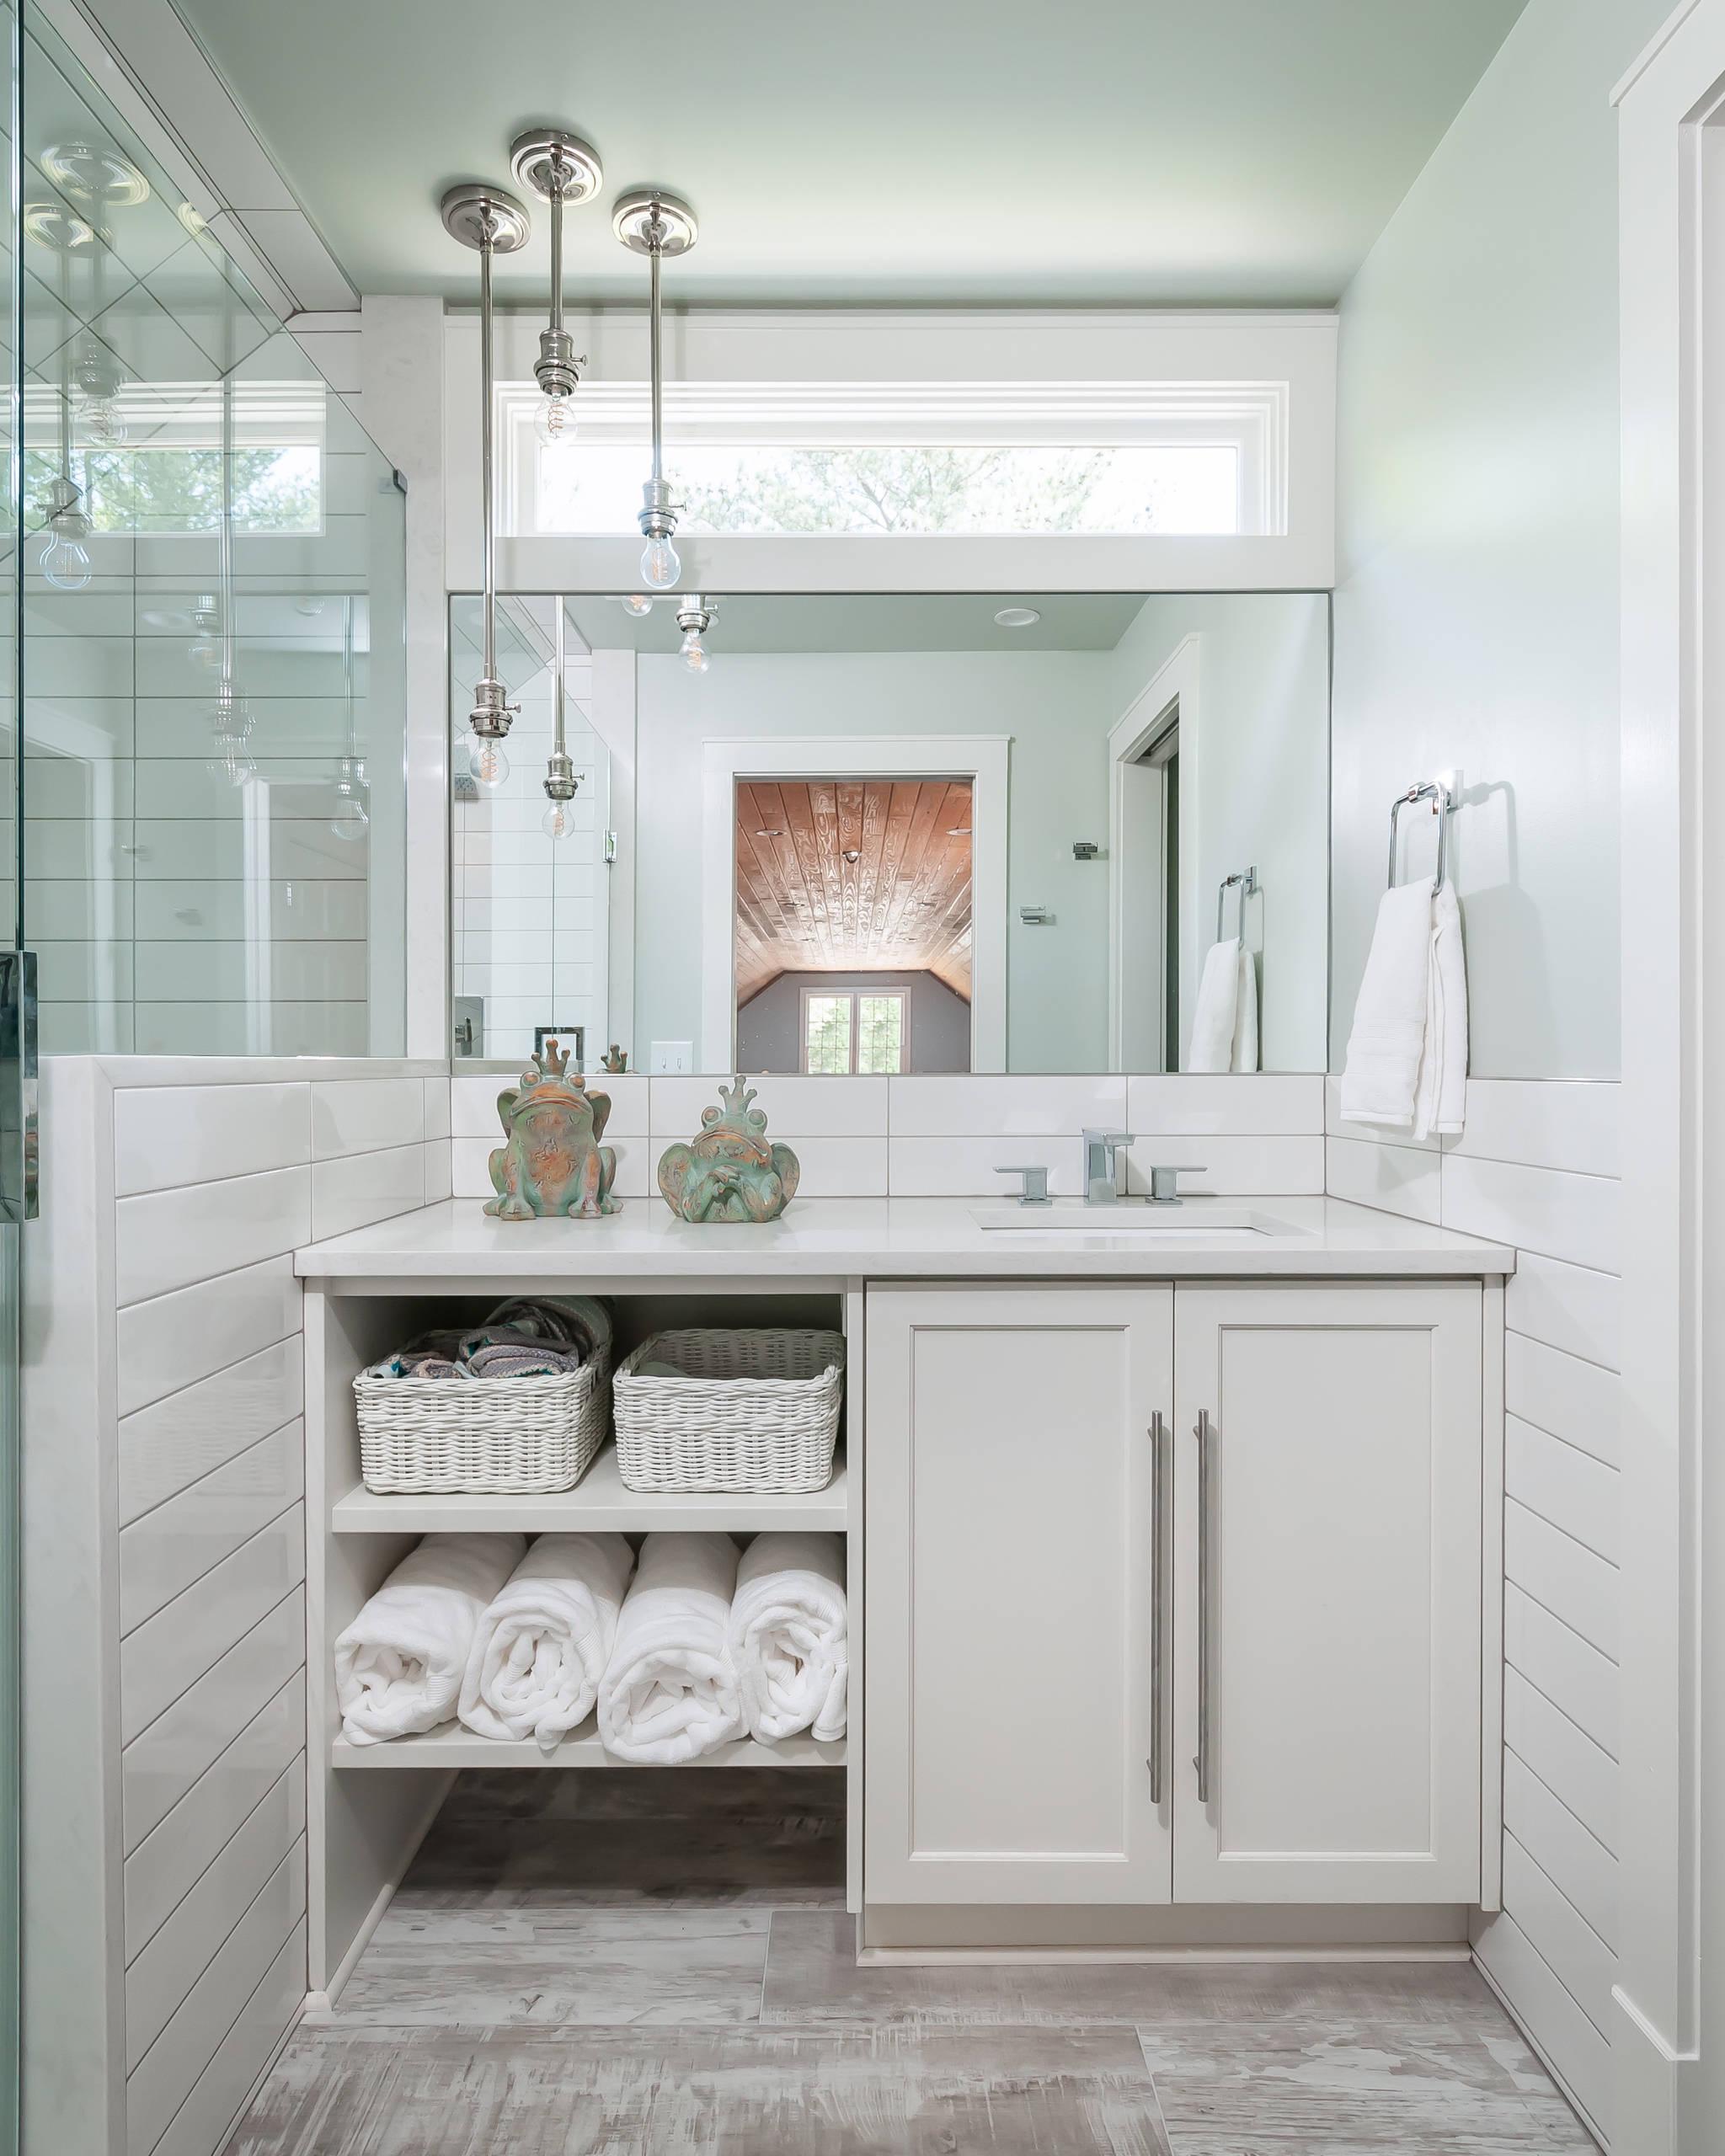 75 Beautiful Small Coastal Bathroom Pictures Ideas April 2021 Houzz